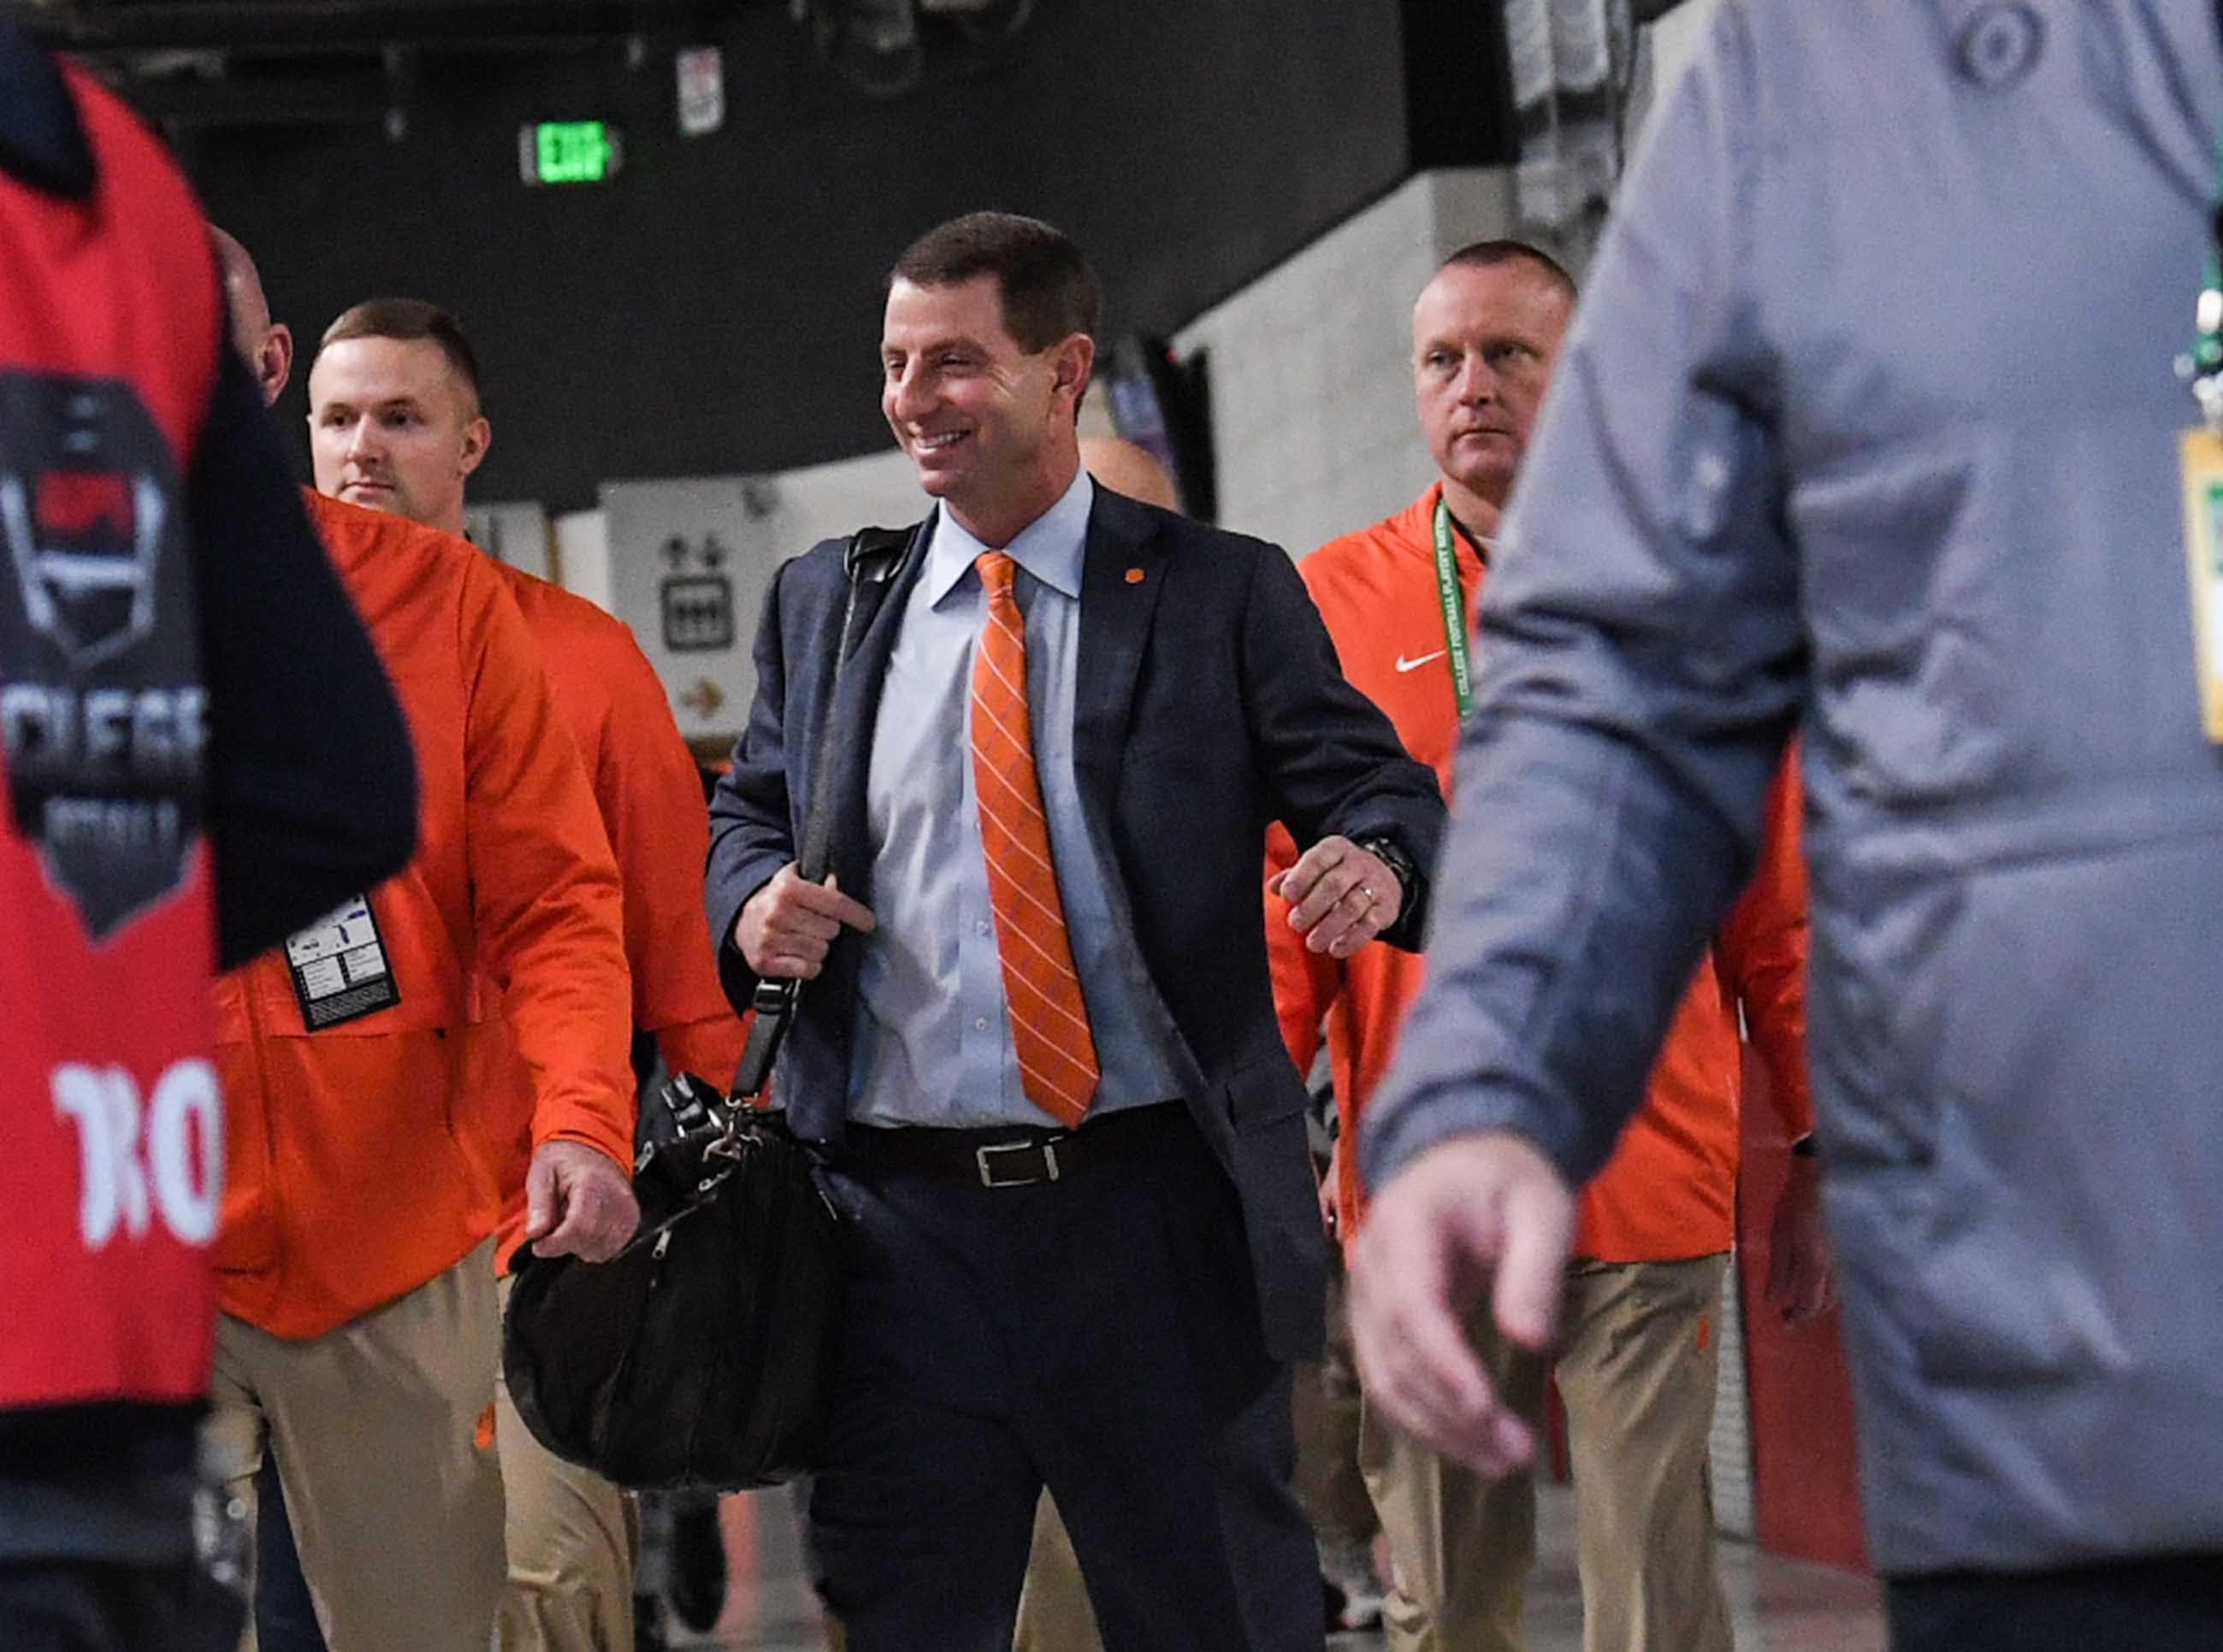 Clemson Head Coach Dabo Swinney arrives before kickoff at Levi's Stadium in Santa Clara, California Monday, January 7, 2019.